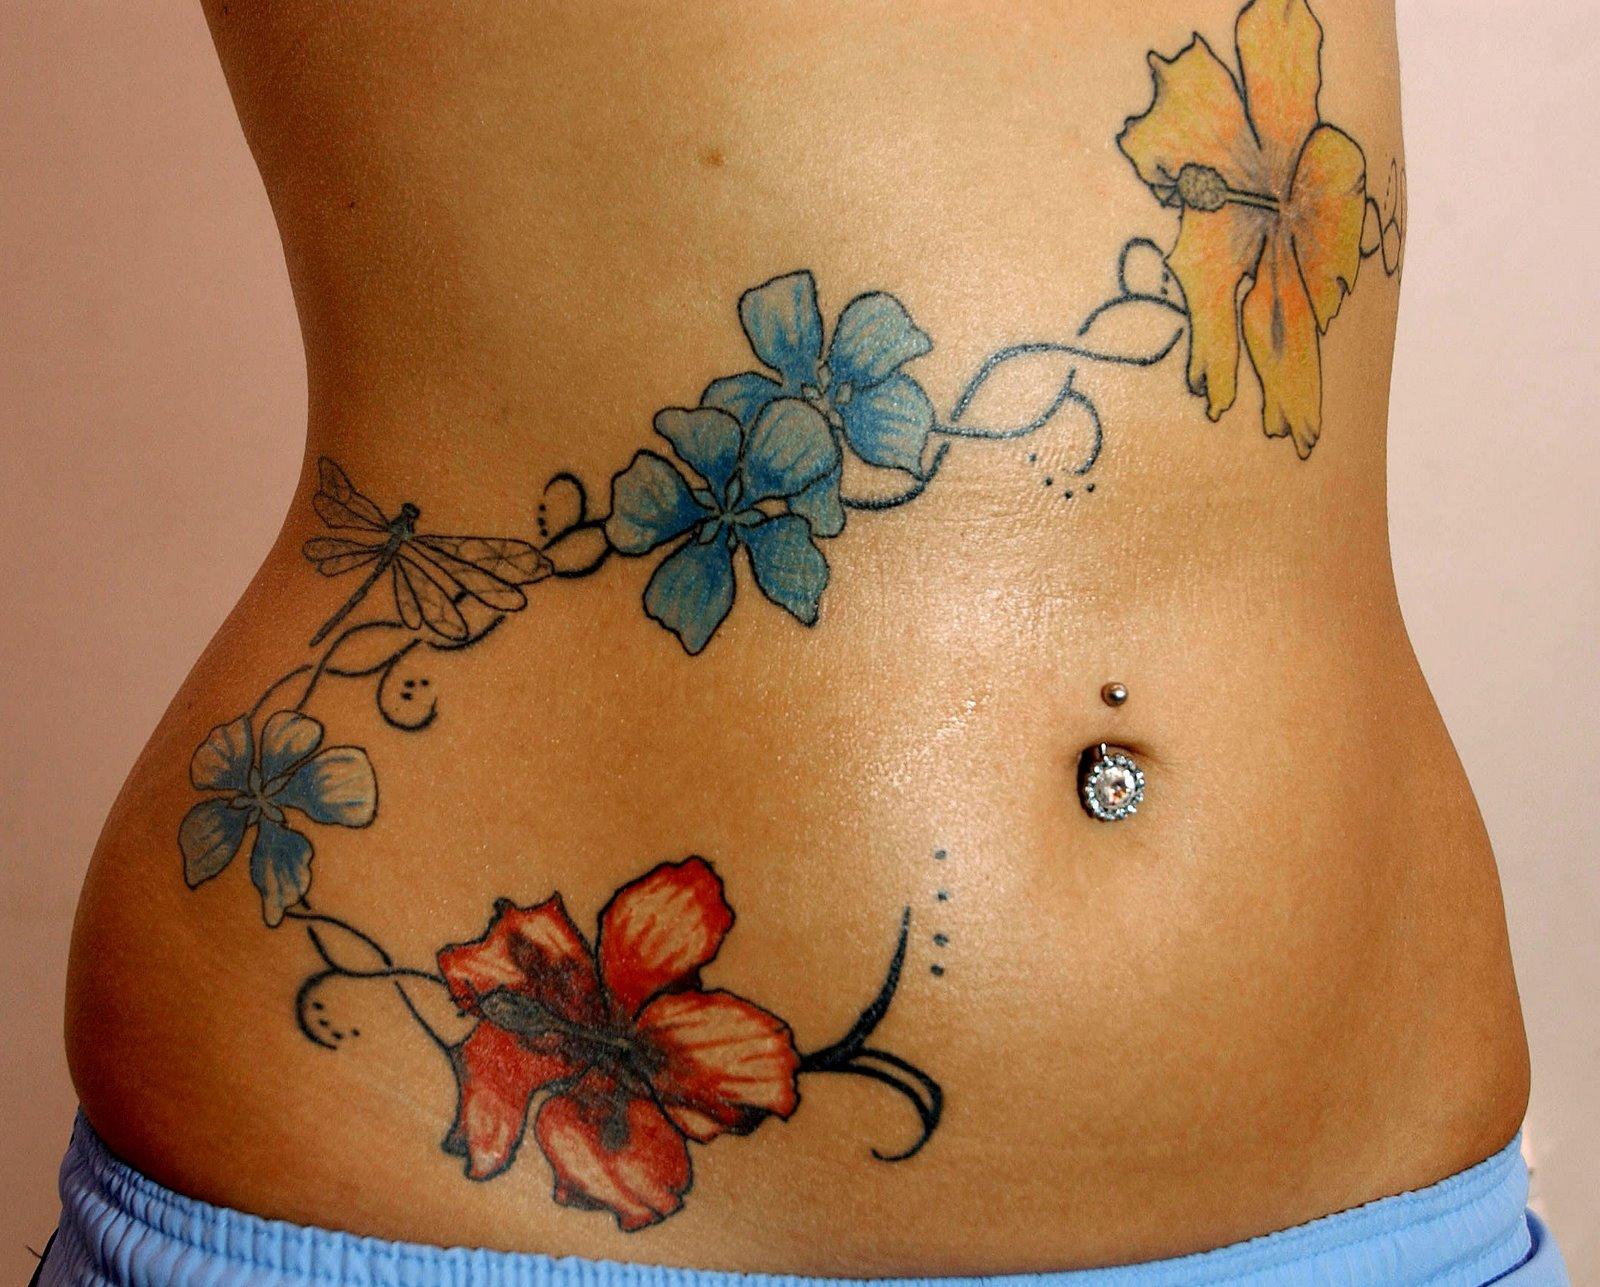 Side Flower Tattoo Designs: Eclipse: Tattoo Designs For Girls